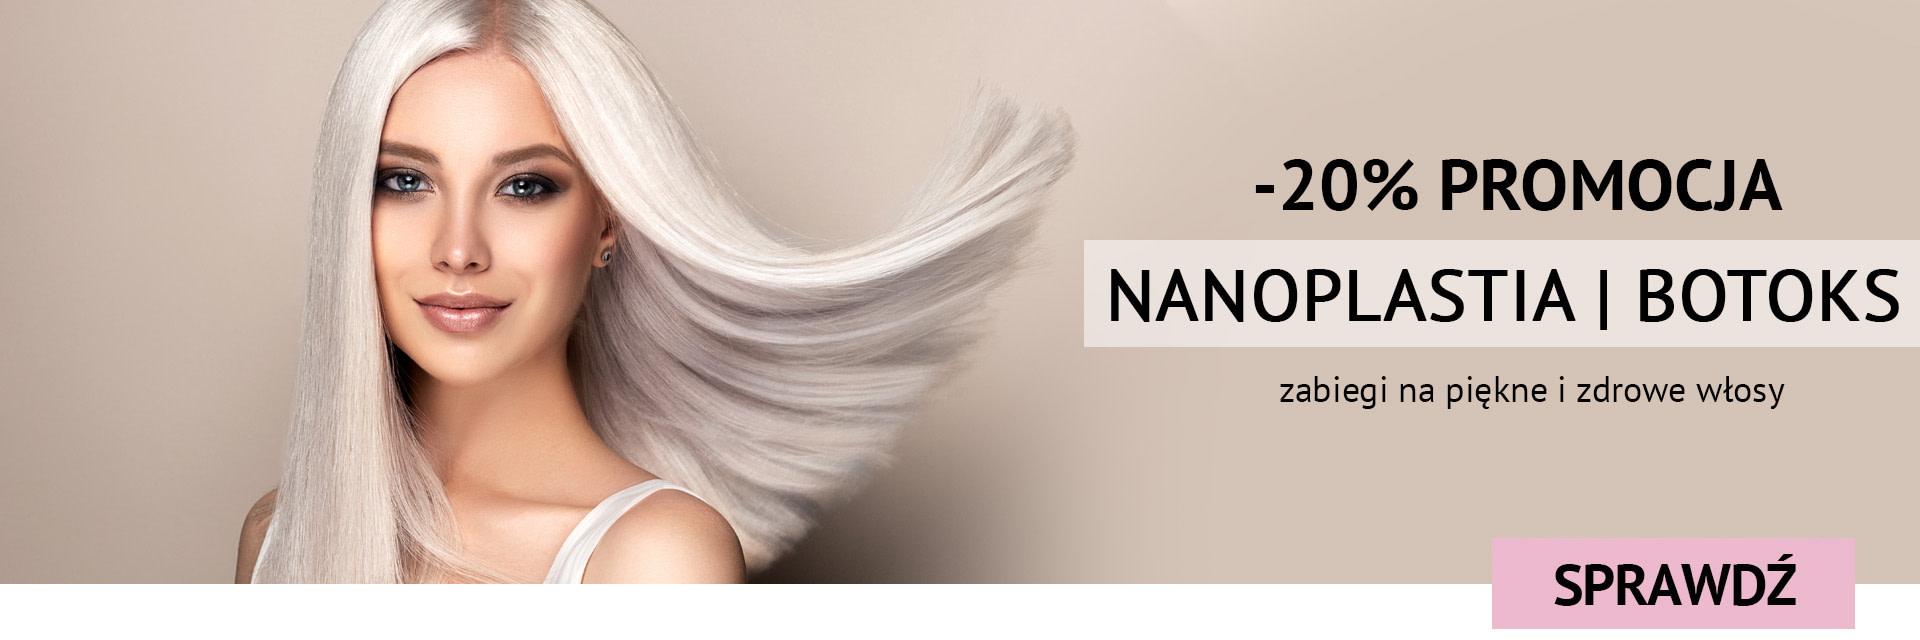 promocja - 20% nanoplastia i botoks